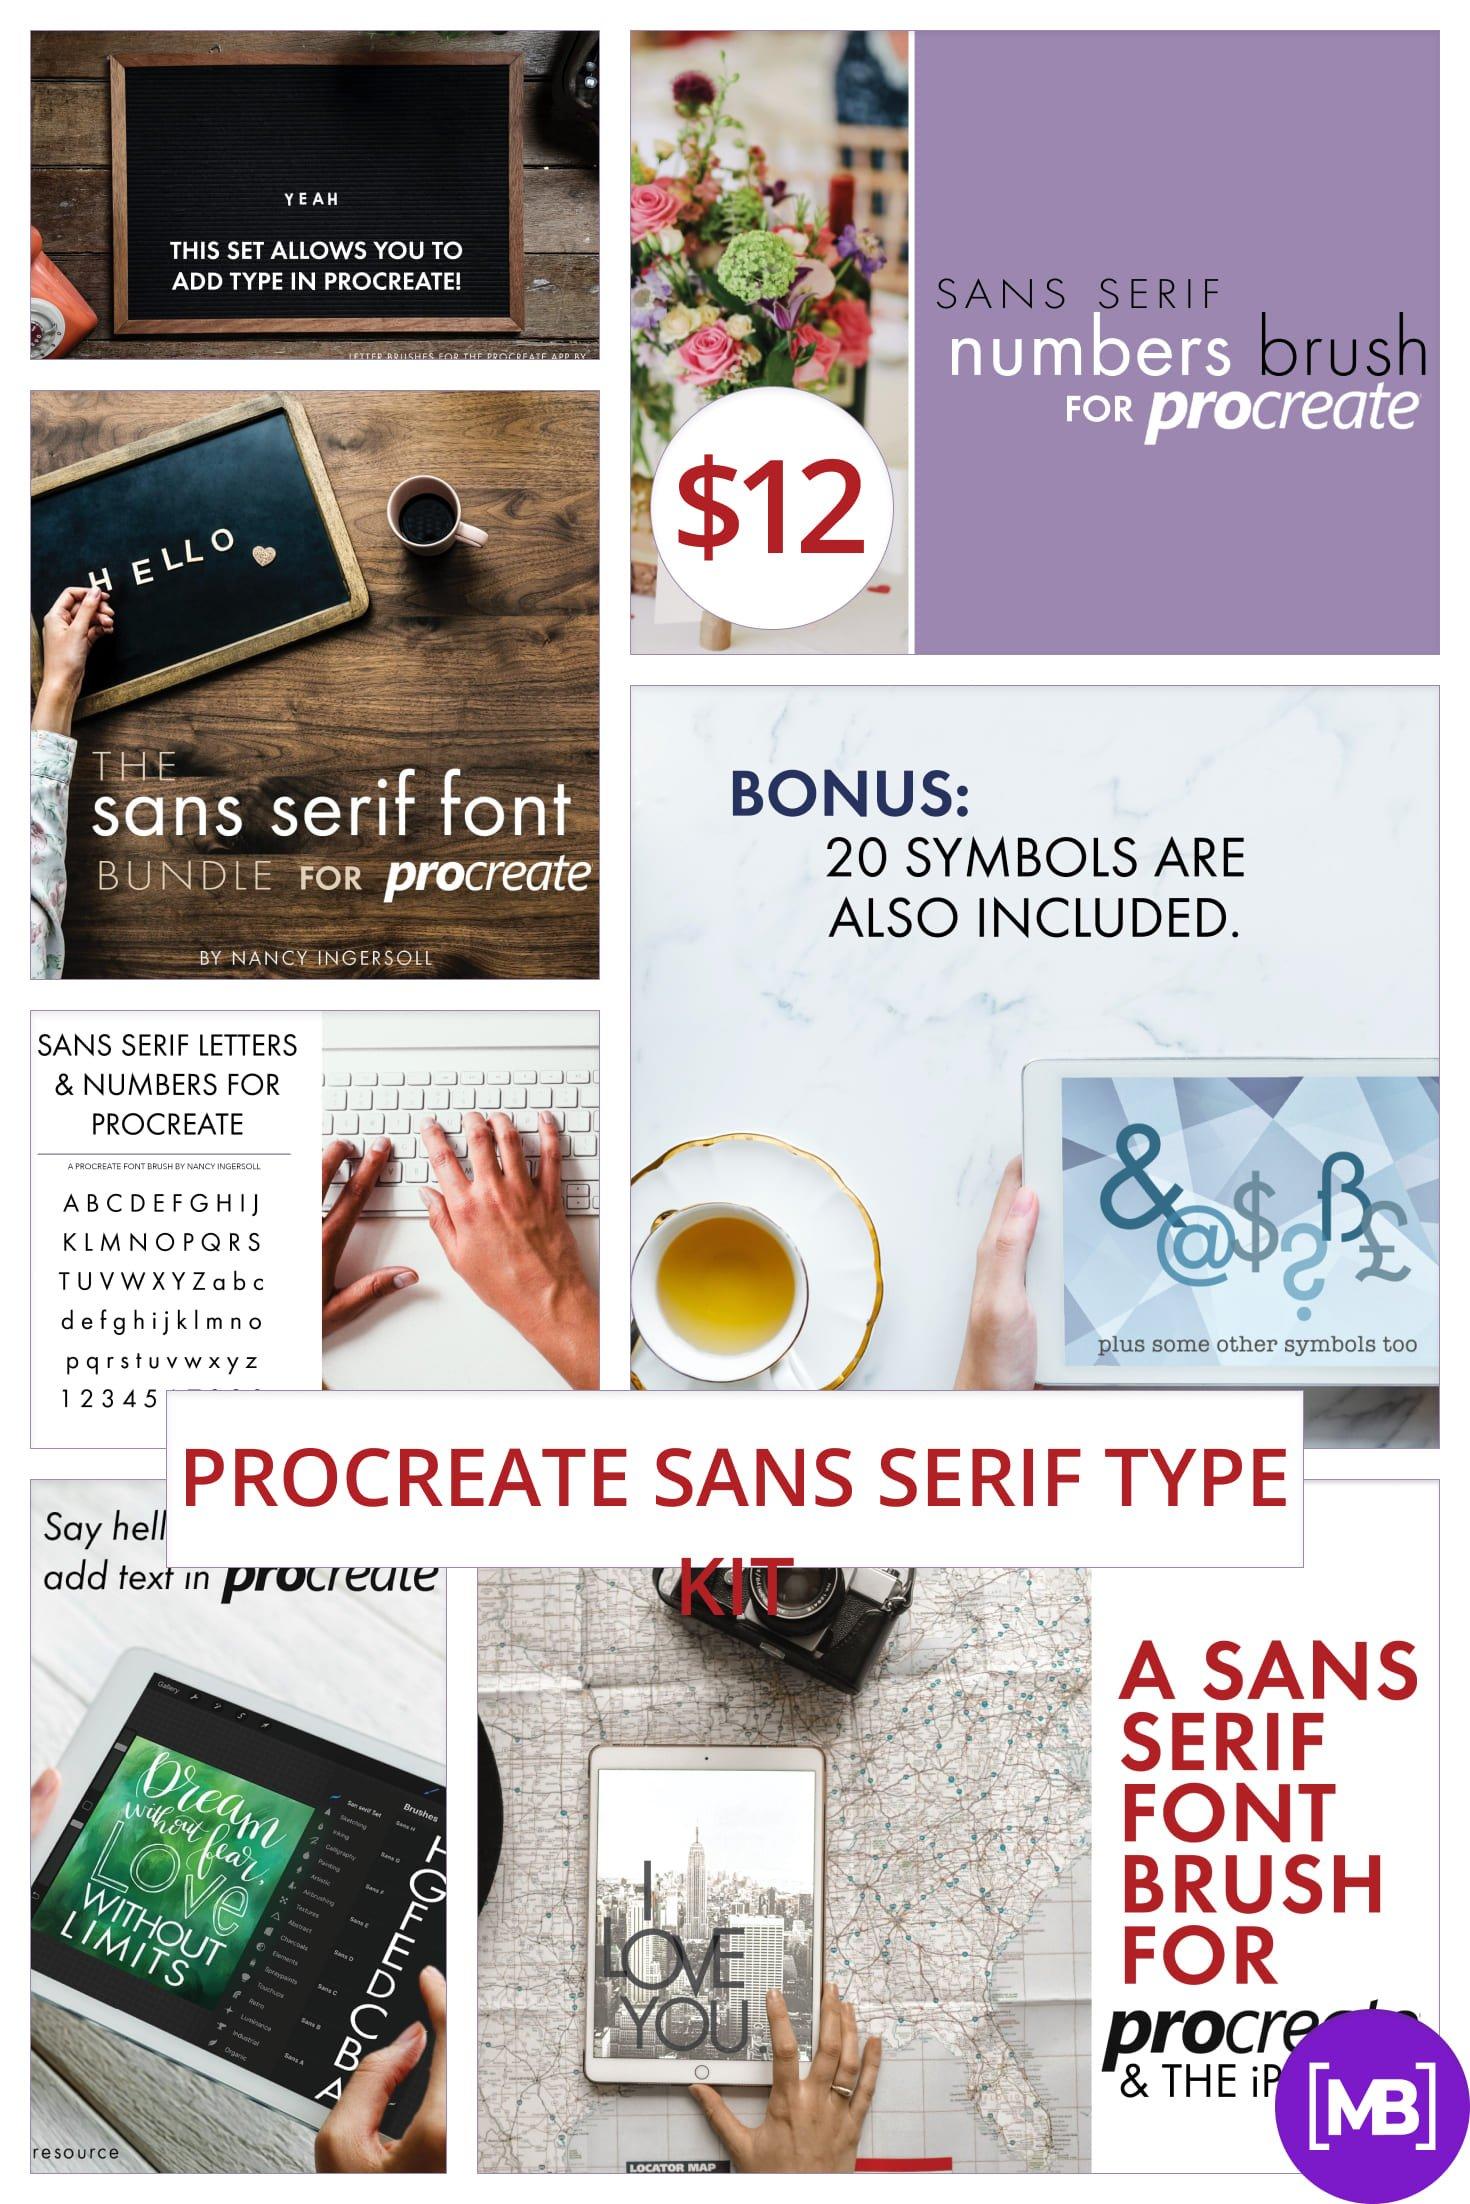 Procreate Sans Serif Type Kit - $12. Collage Image.